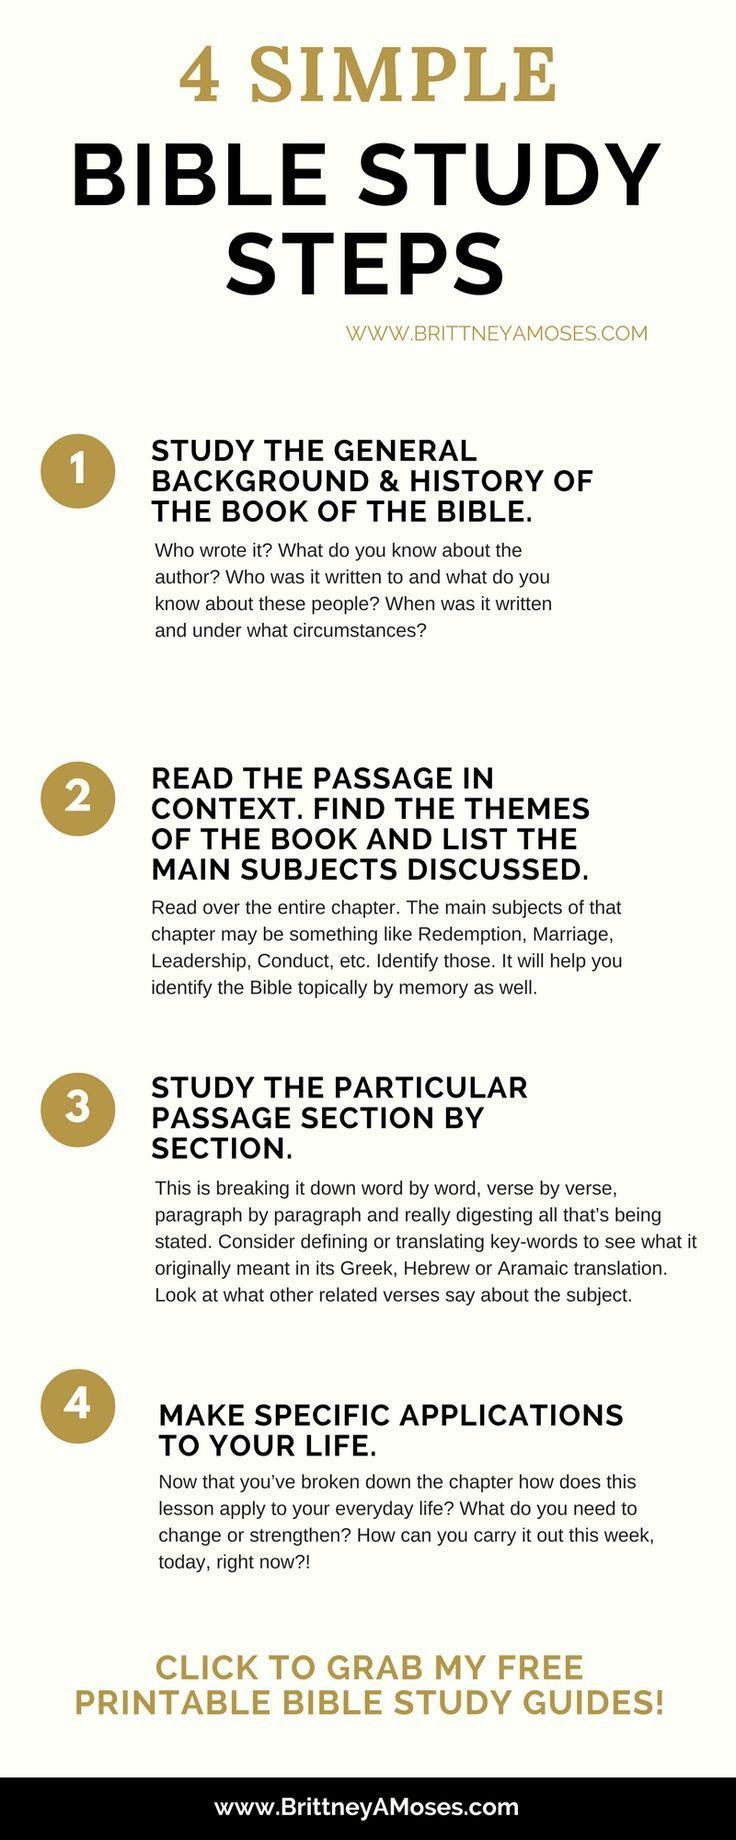 4 Simple Bible Study Steps | God's Word | Pinterest | Bible, Bible - Free Printable Ladies Bible Study Lessons